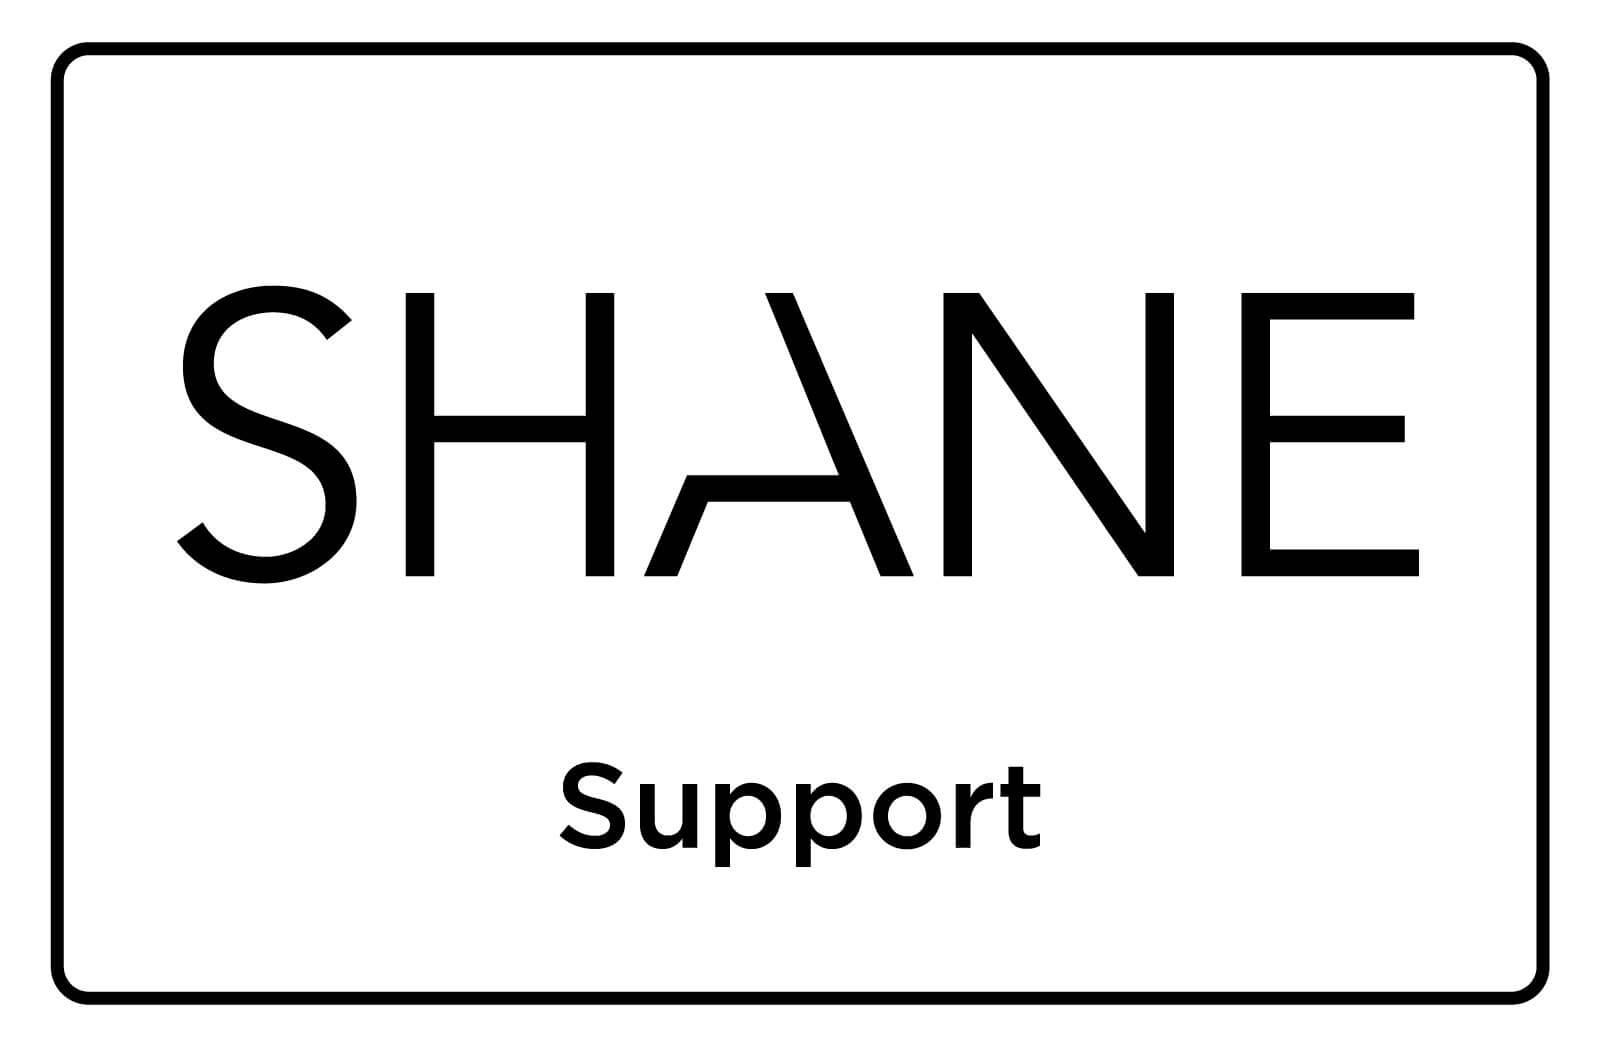 SHANE Support